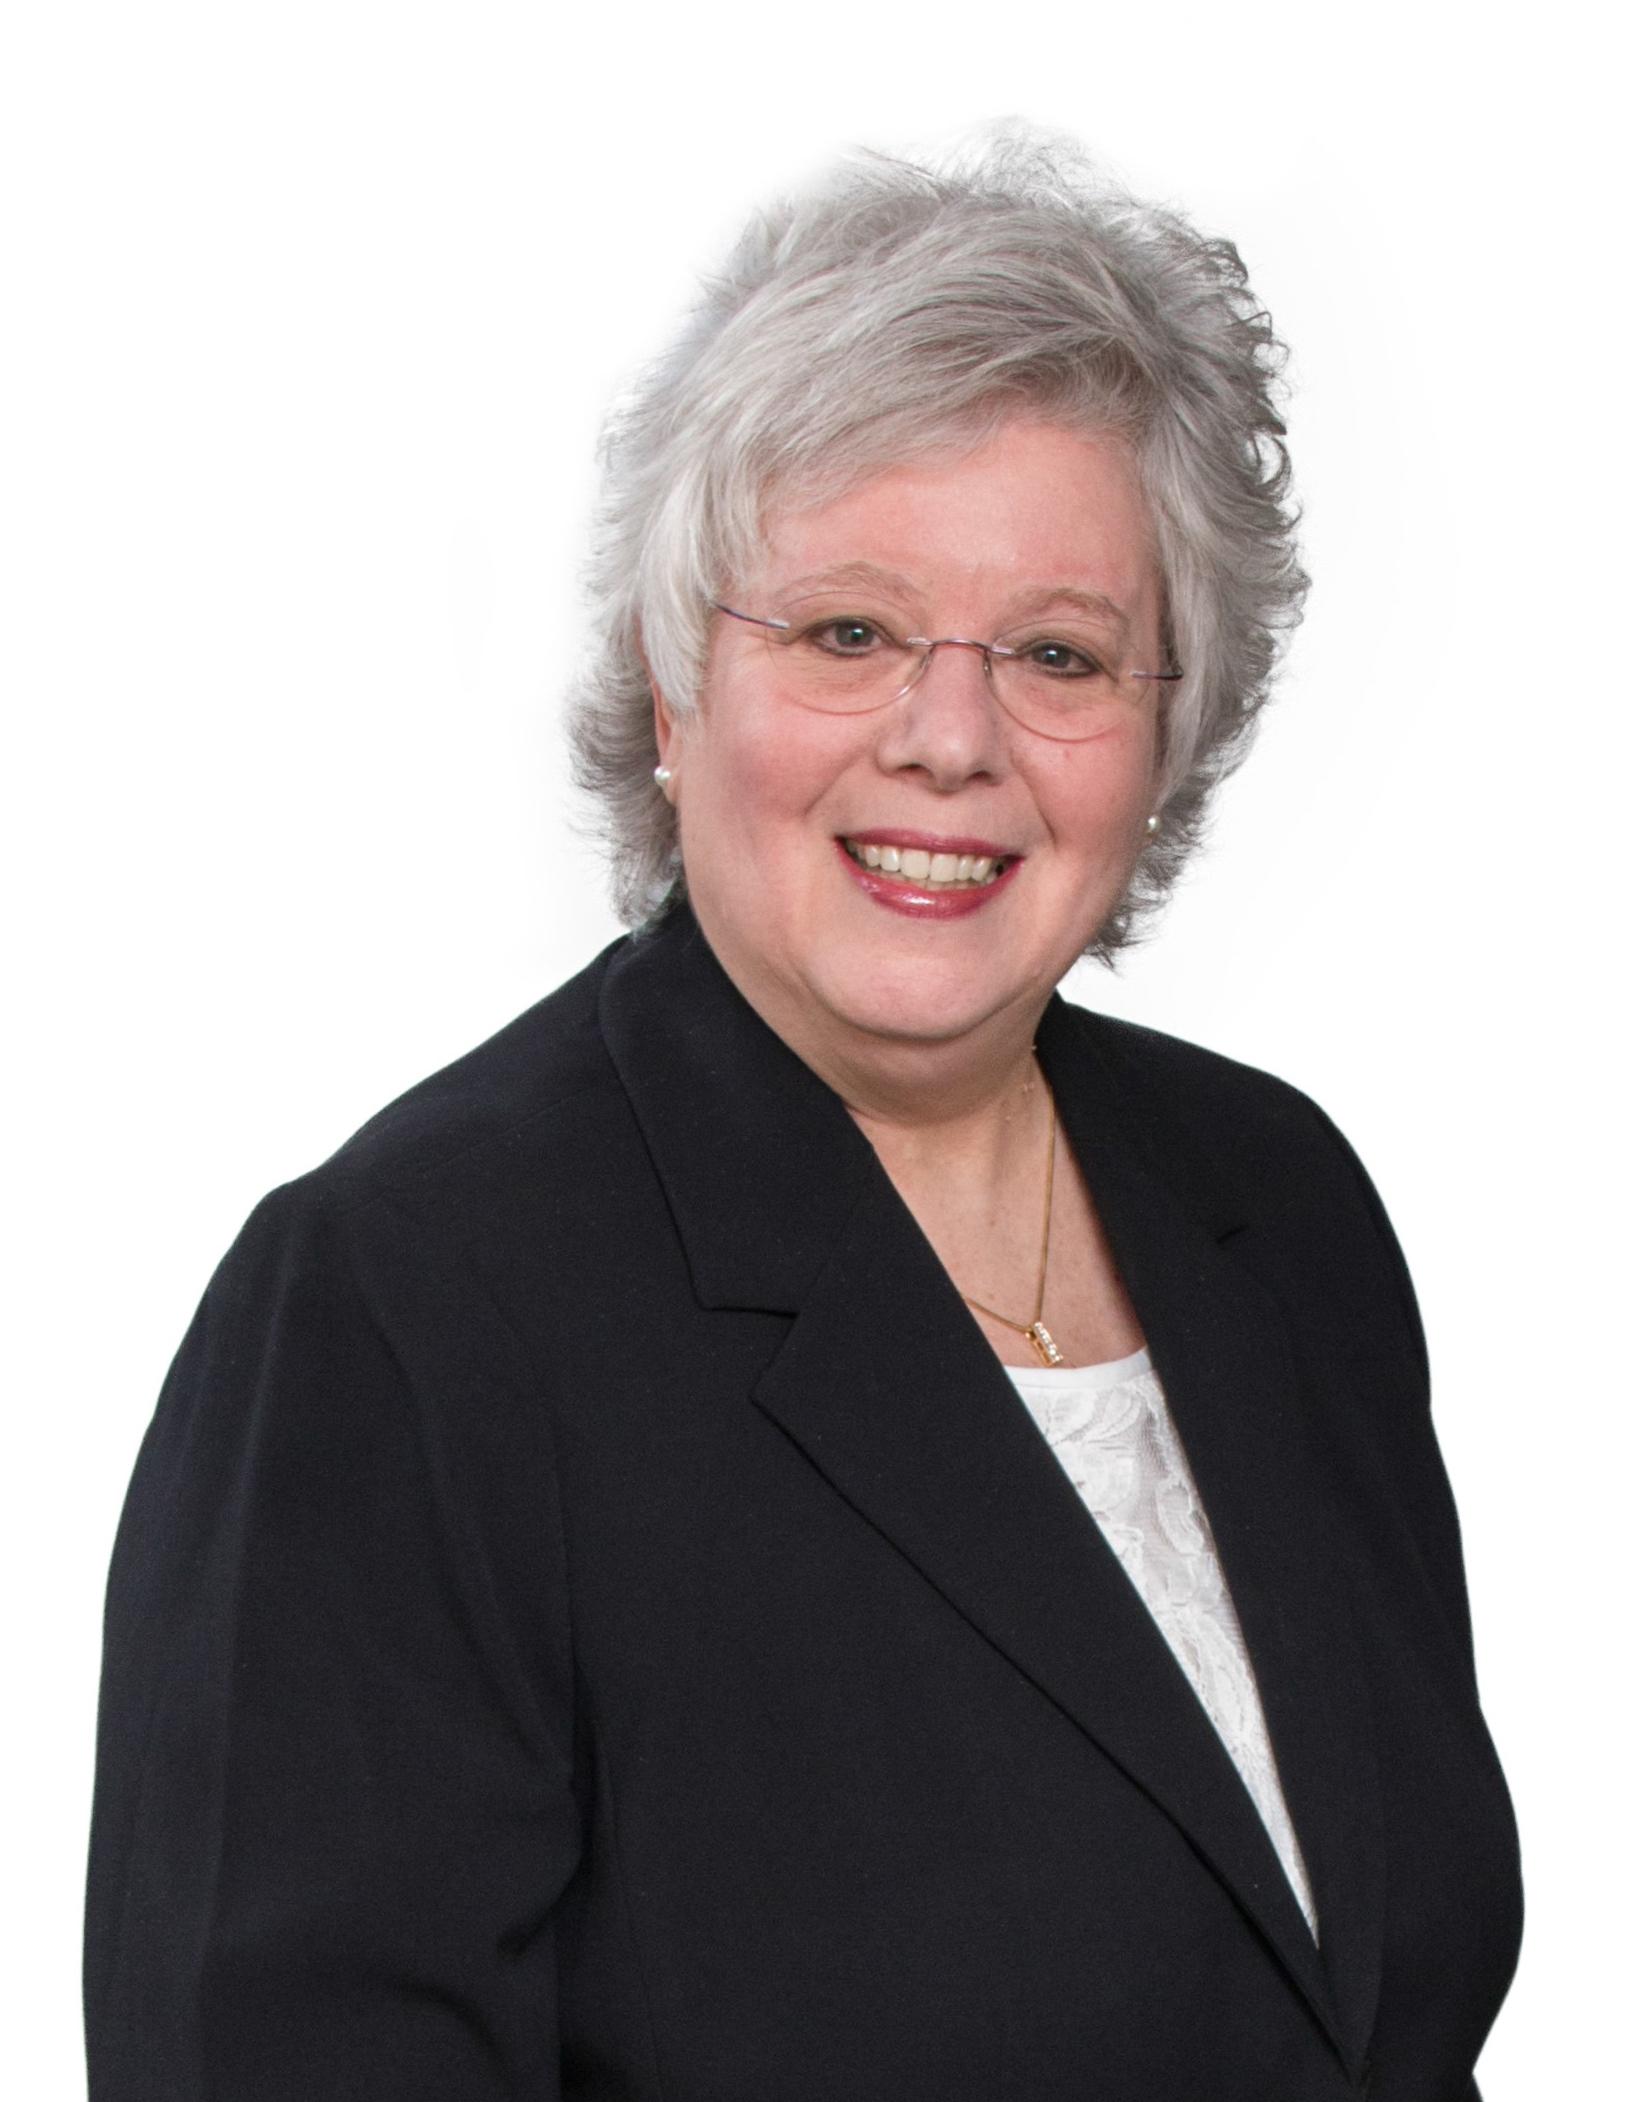 Myrna Malkin